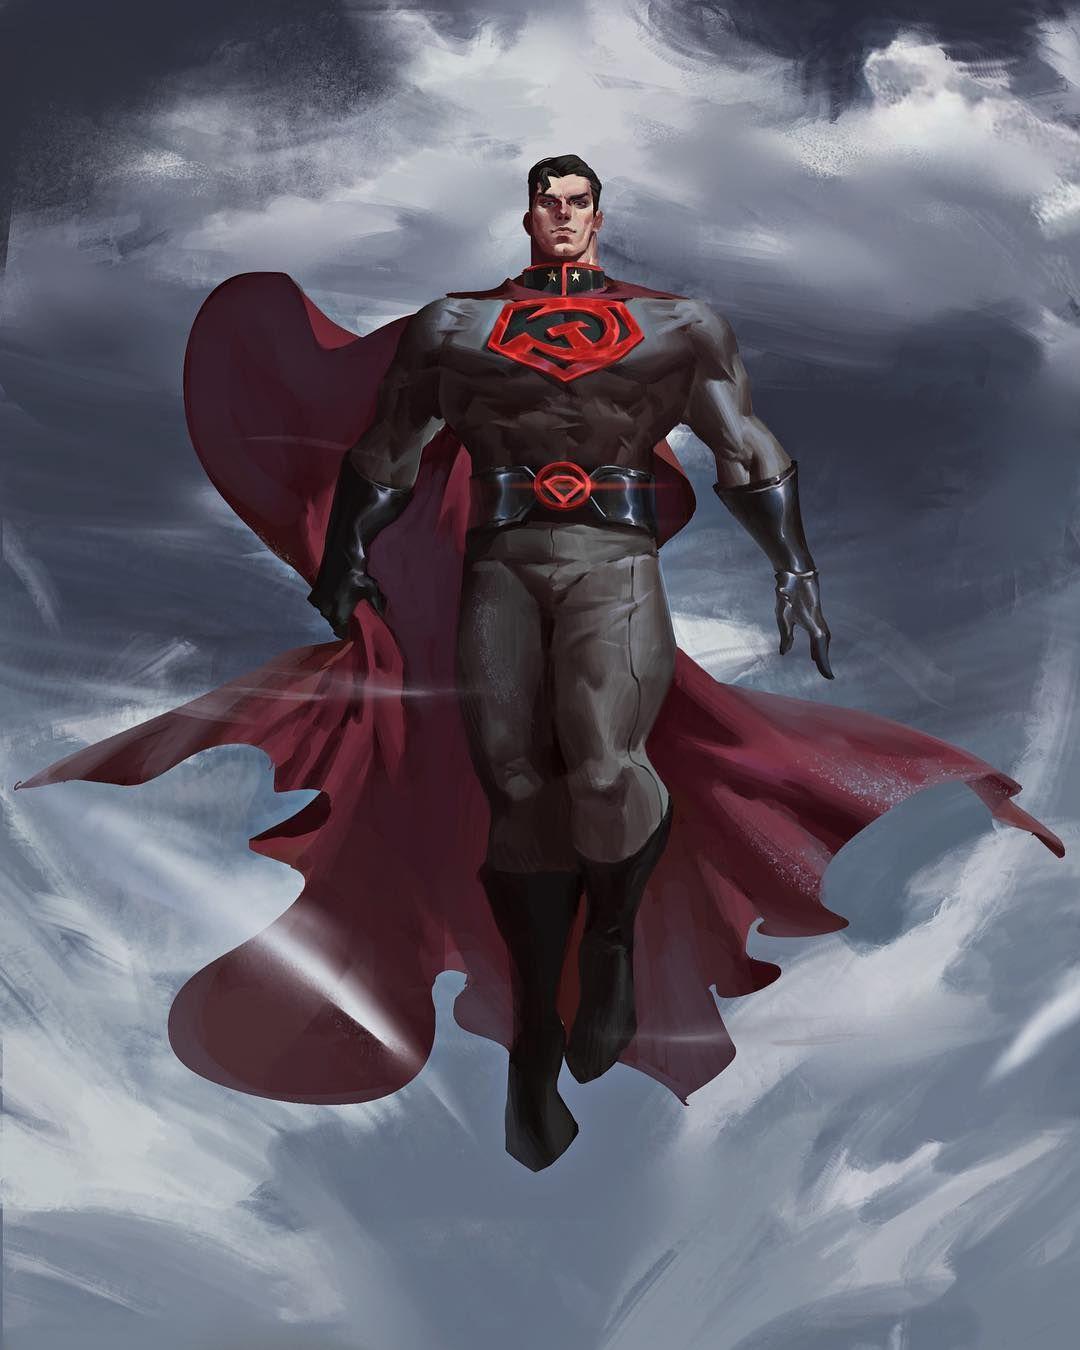 By Peng Nanfeng Superman Redson Dc Dccomics Personagens Literarios Superhomem Herois De Quadrinhos